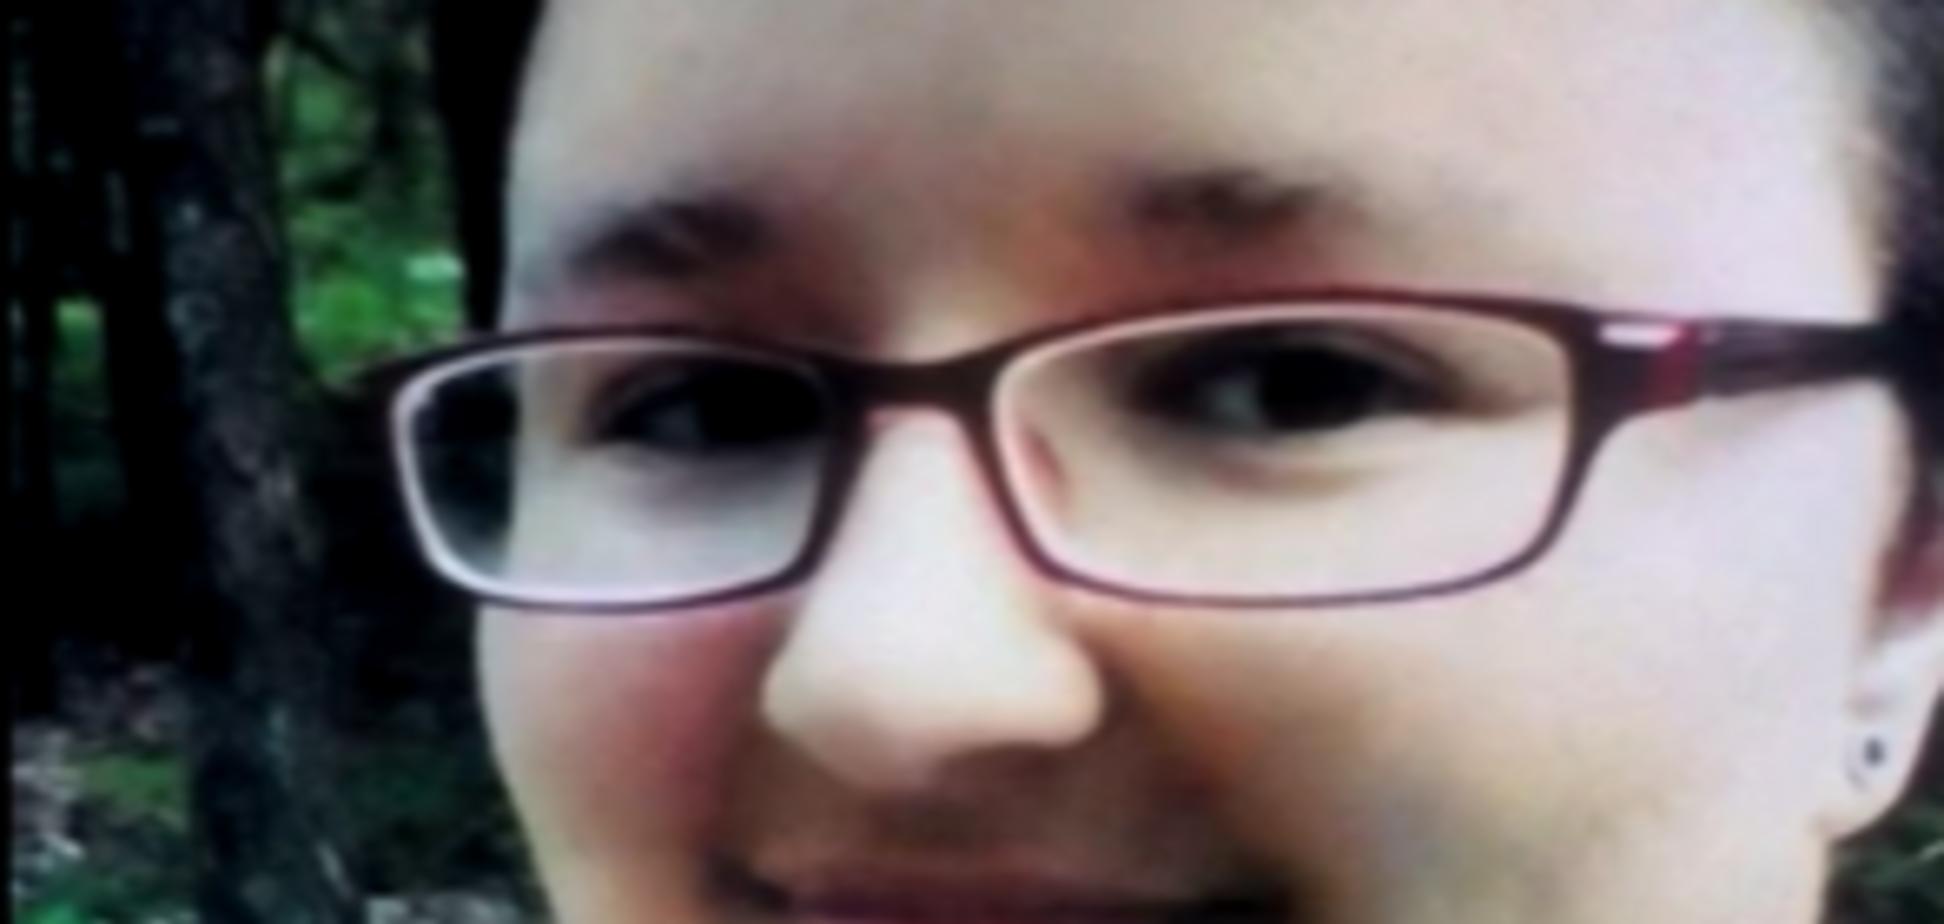 В Кривом Роге пропала девушка со шрамом